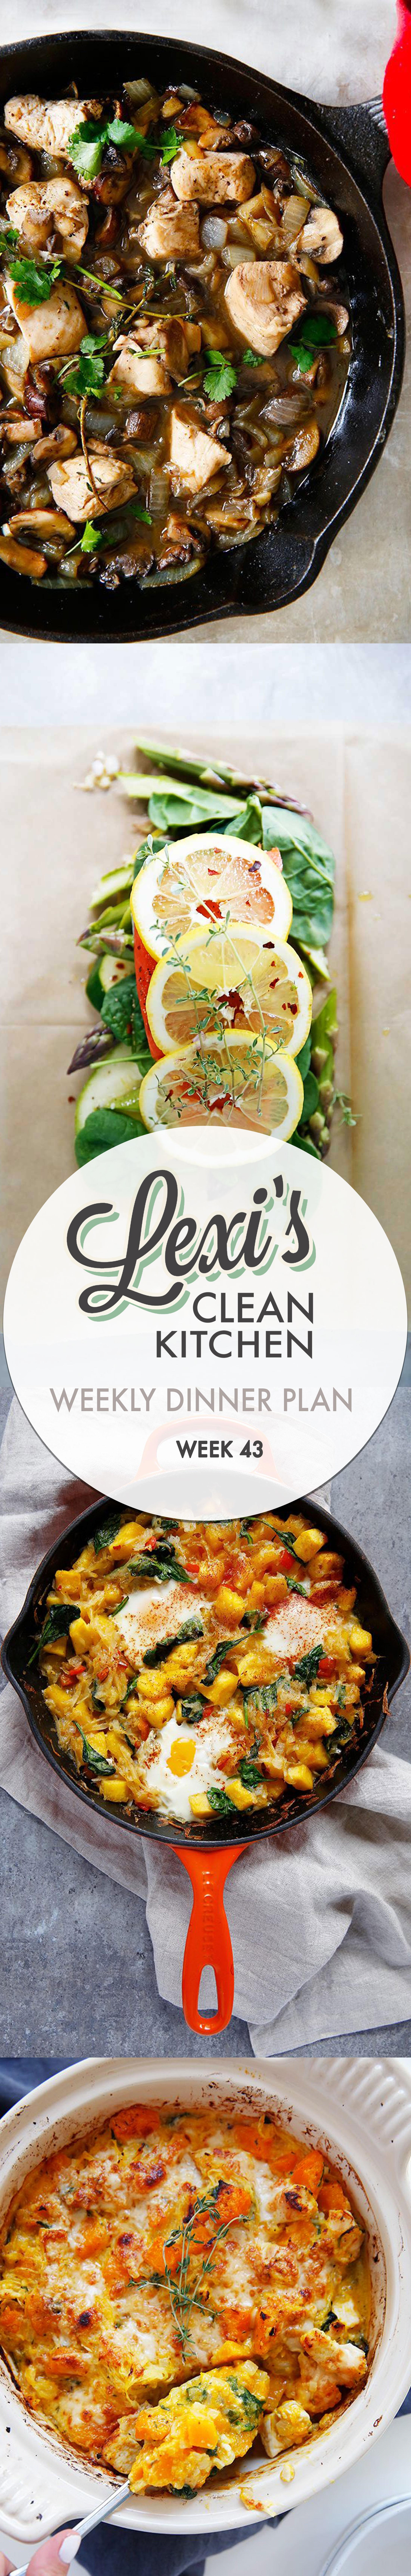 Weekly Dinner Plan Week 43 | Lexi's Clean Kitchen